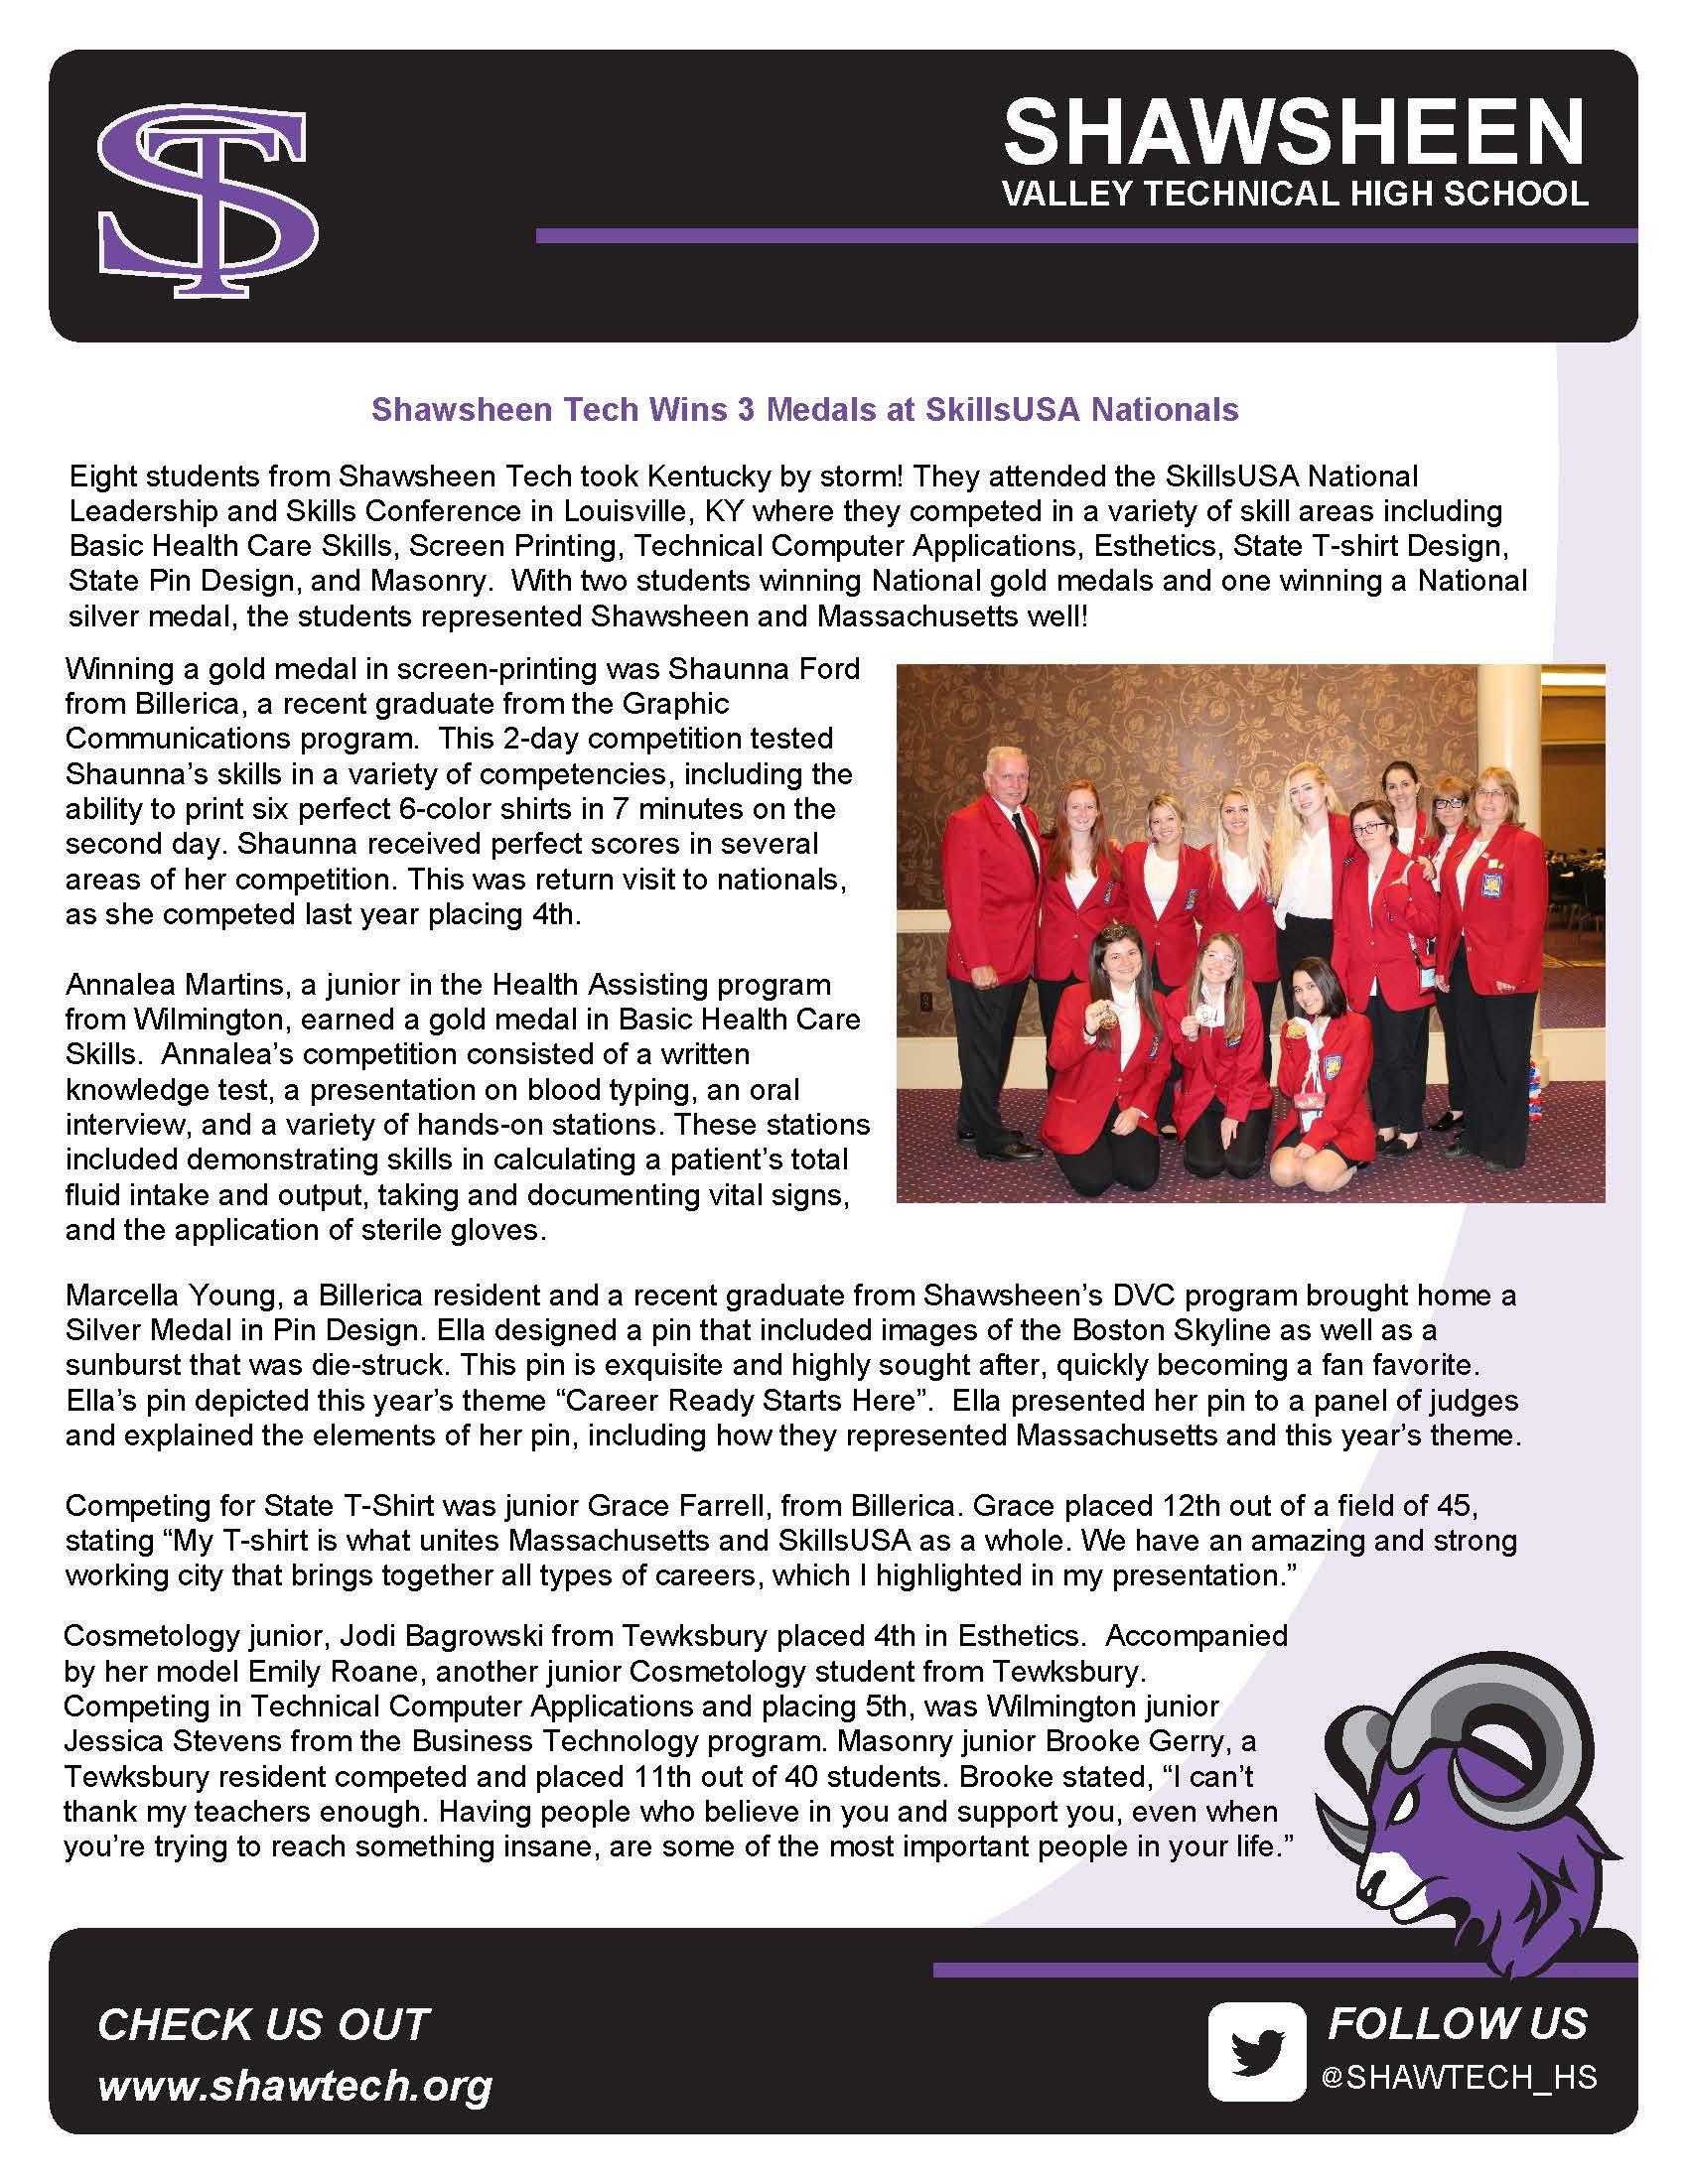 Shawsheen Valley Technical High School / Homepage